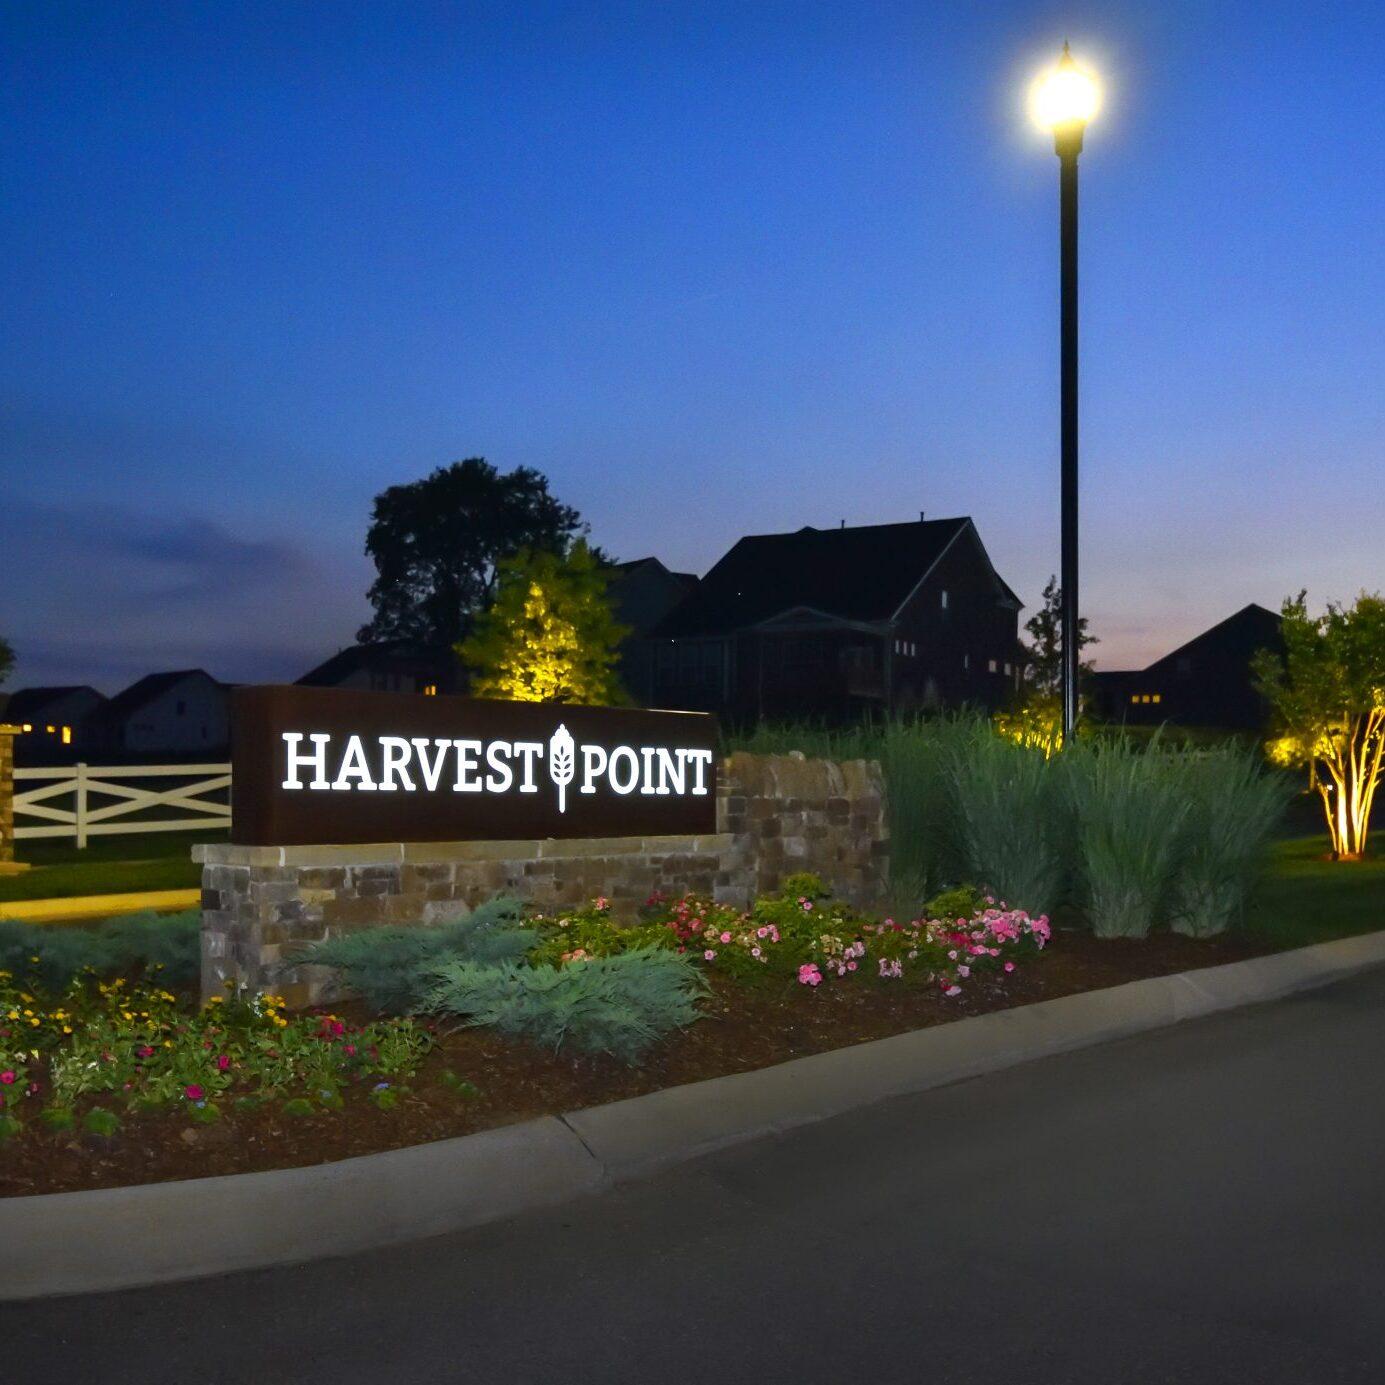 Harvest Point Dusk Entry Photo